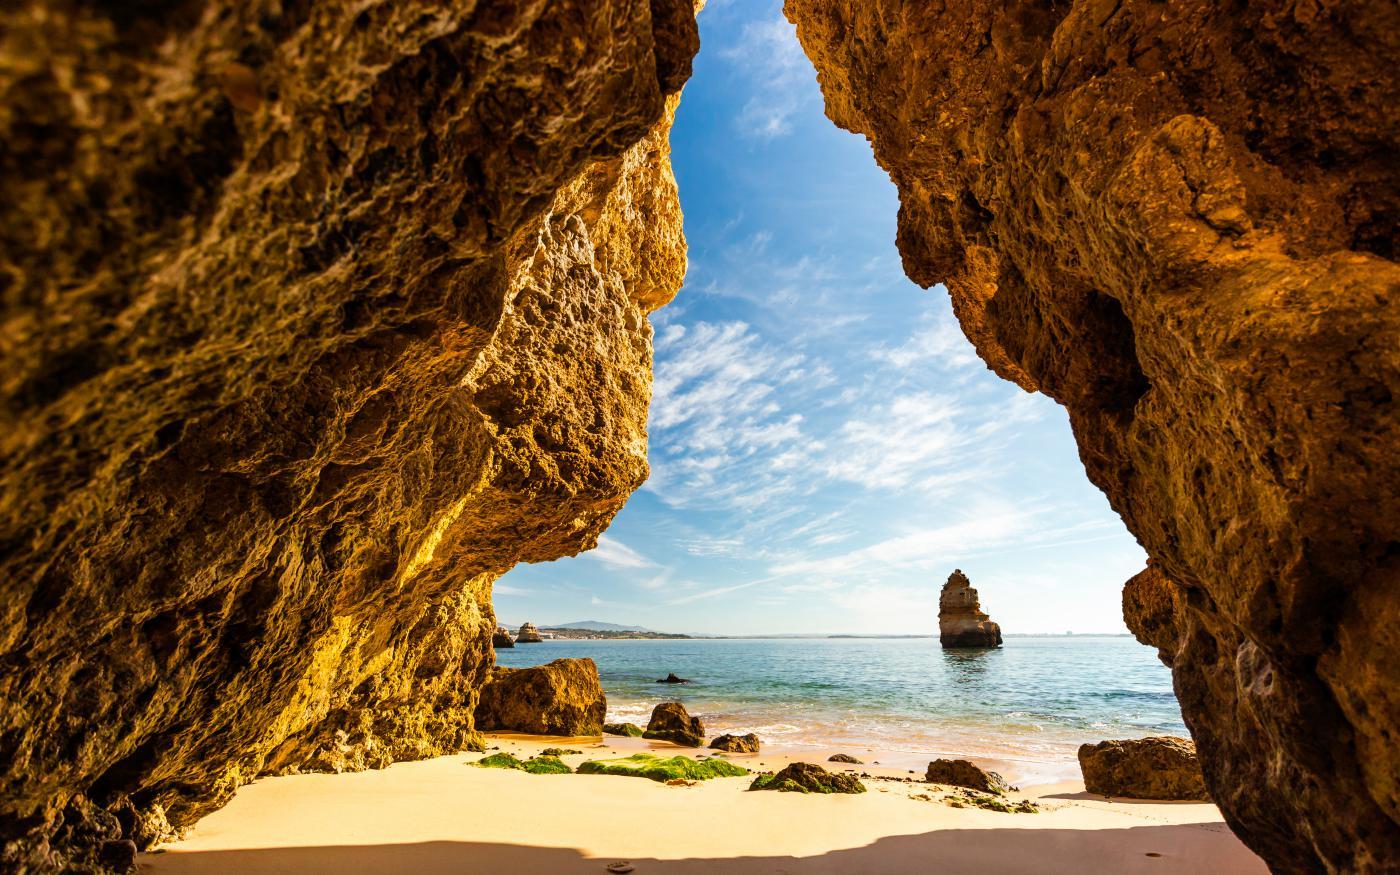 Algarve uitgeroepen tot beste strandbestemming van Europa